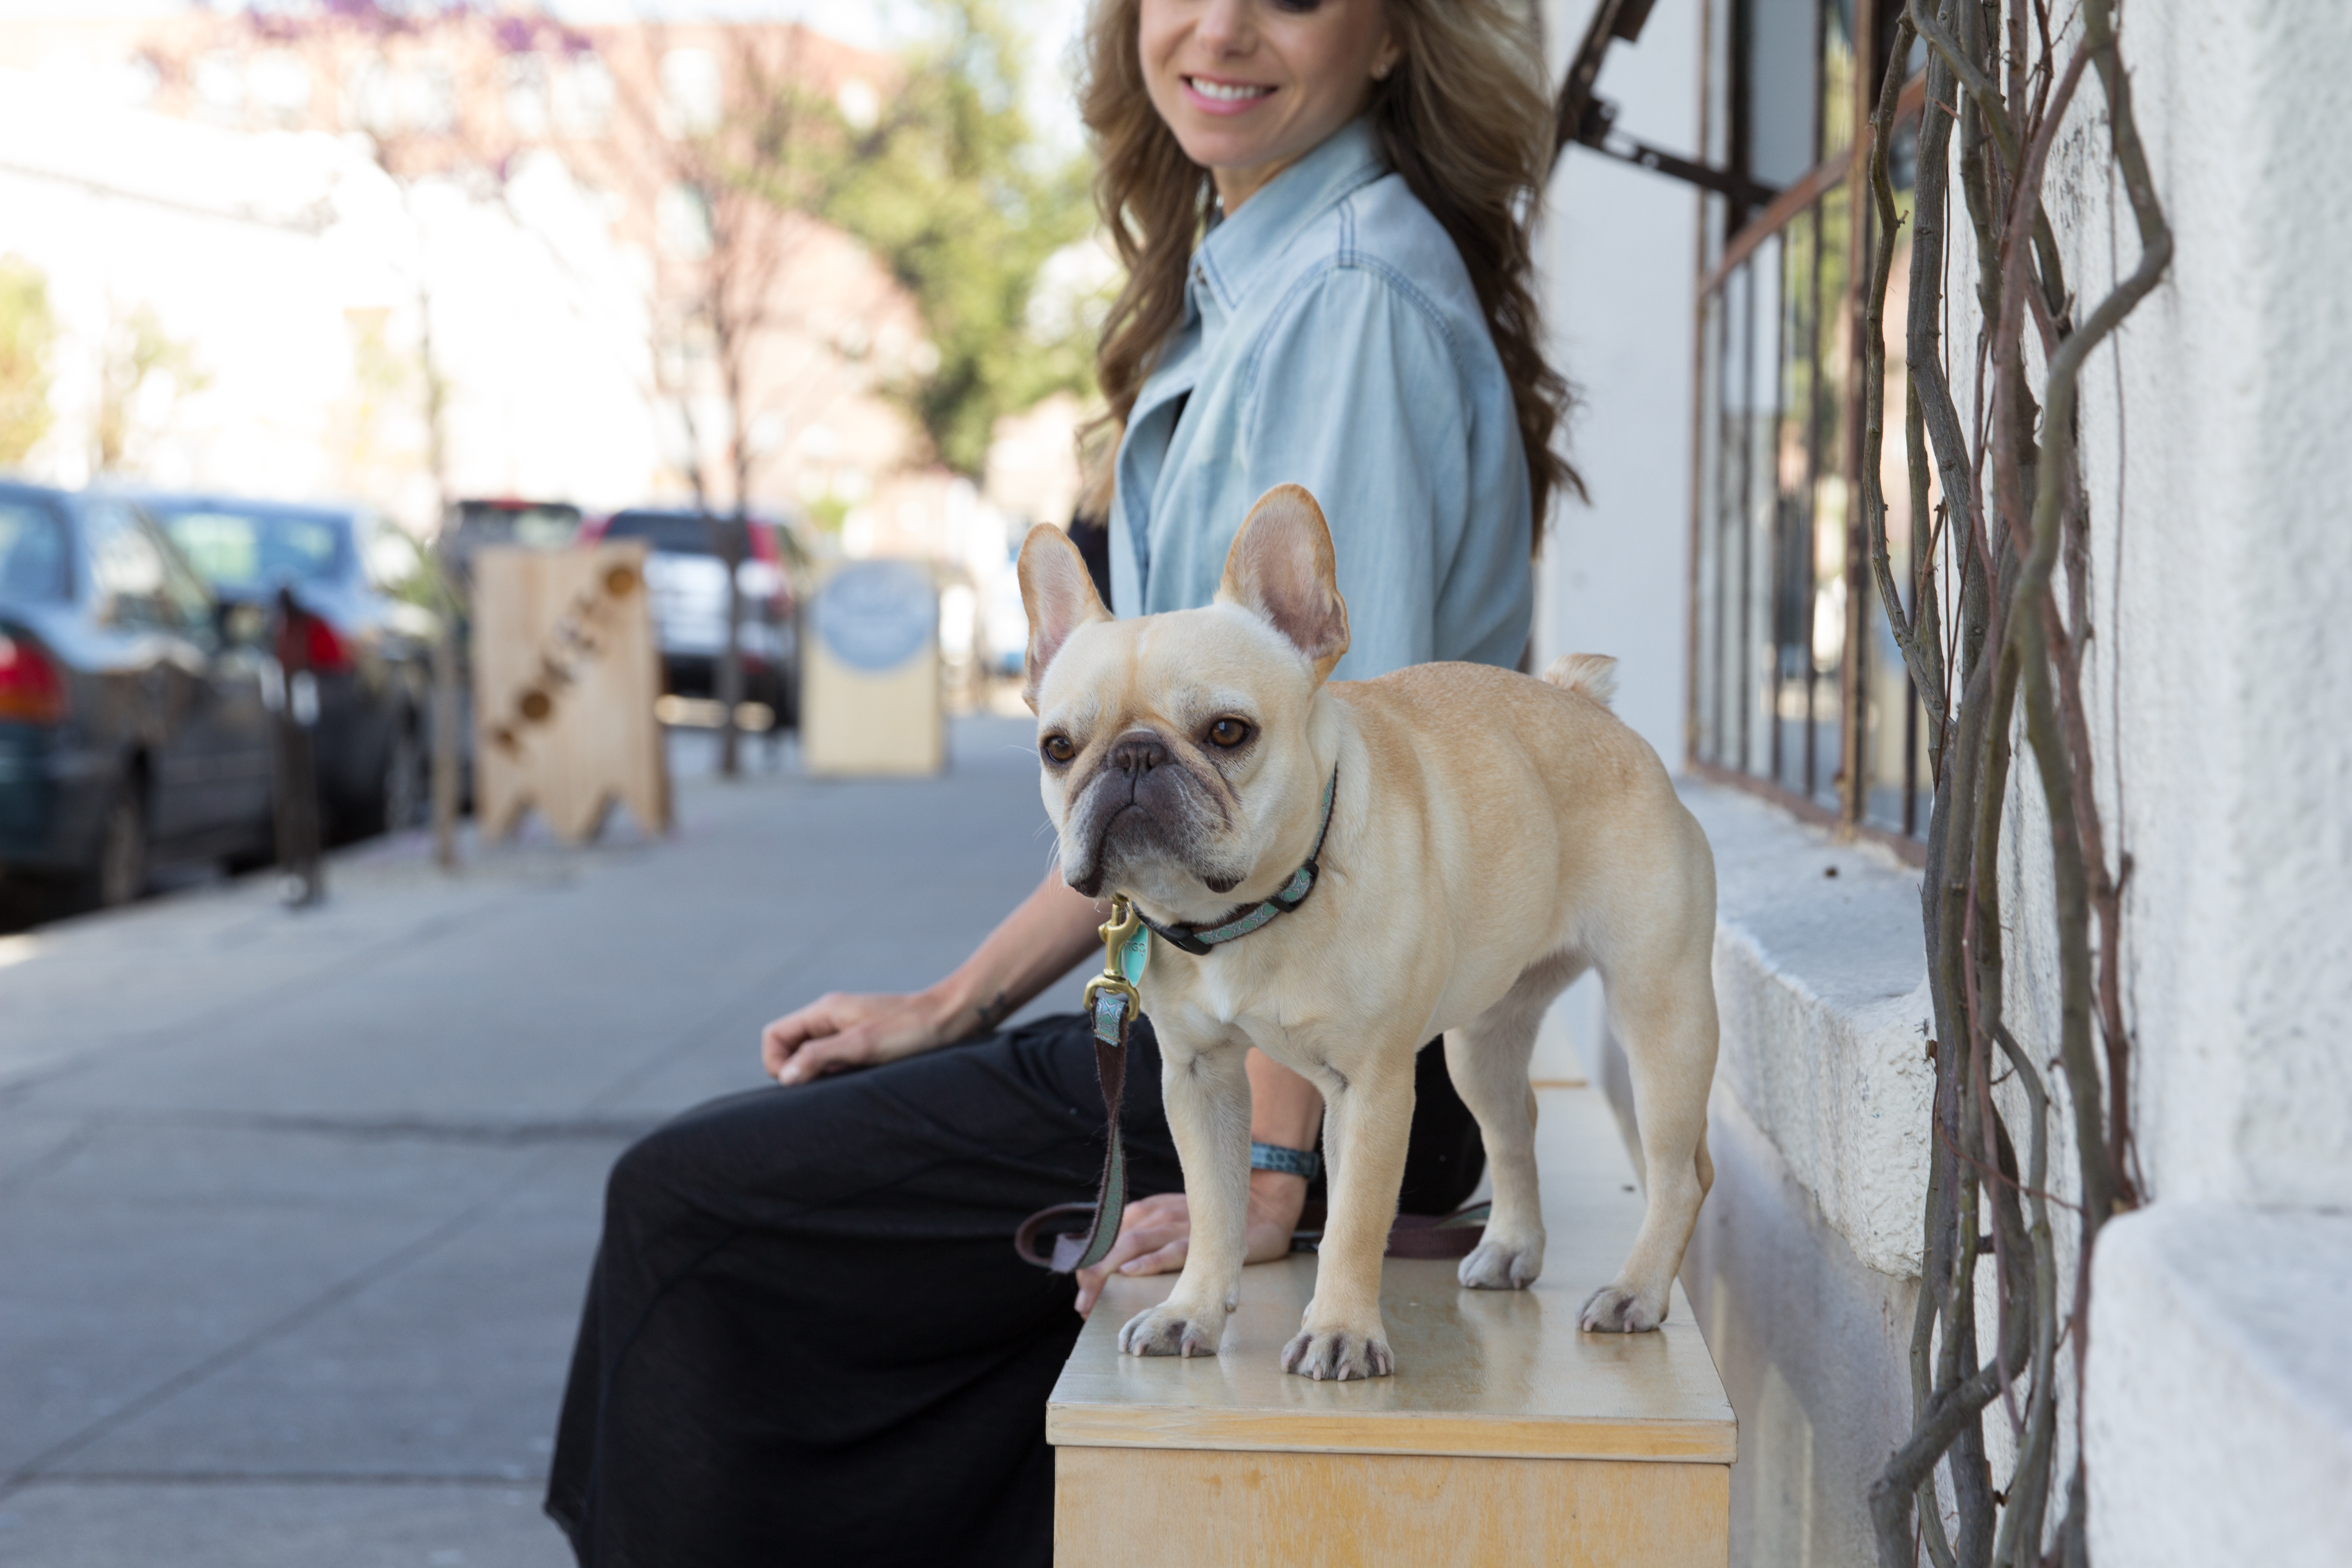 Lfs dog owner outsidebench